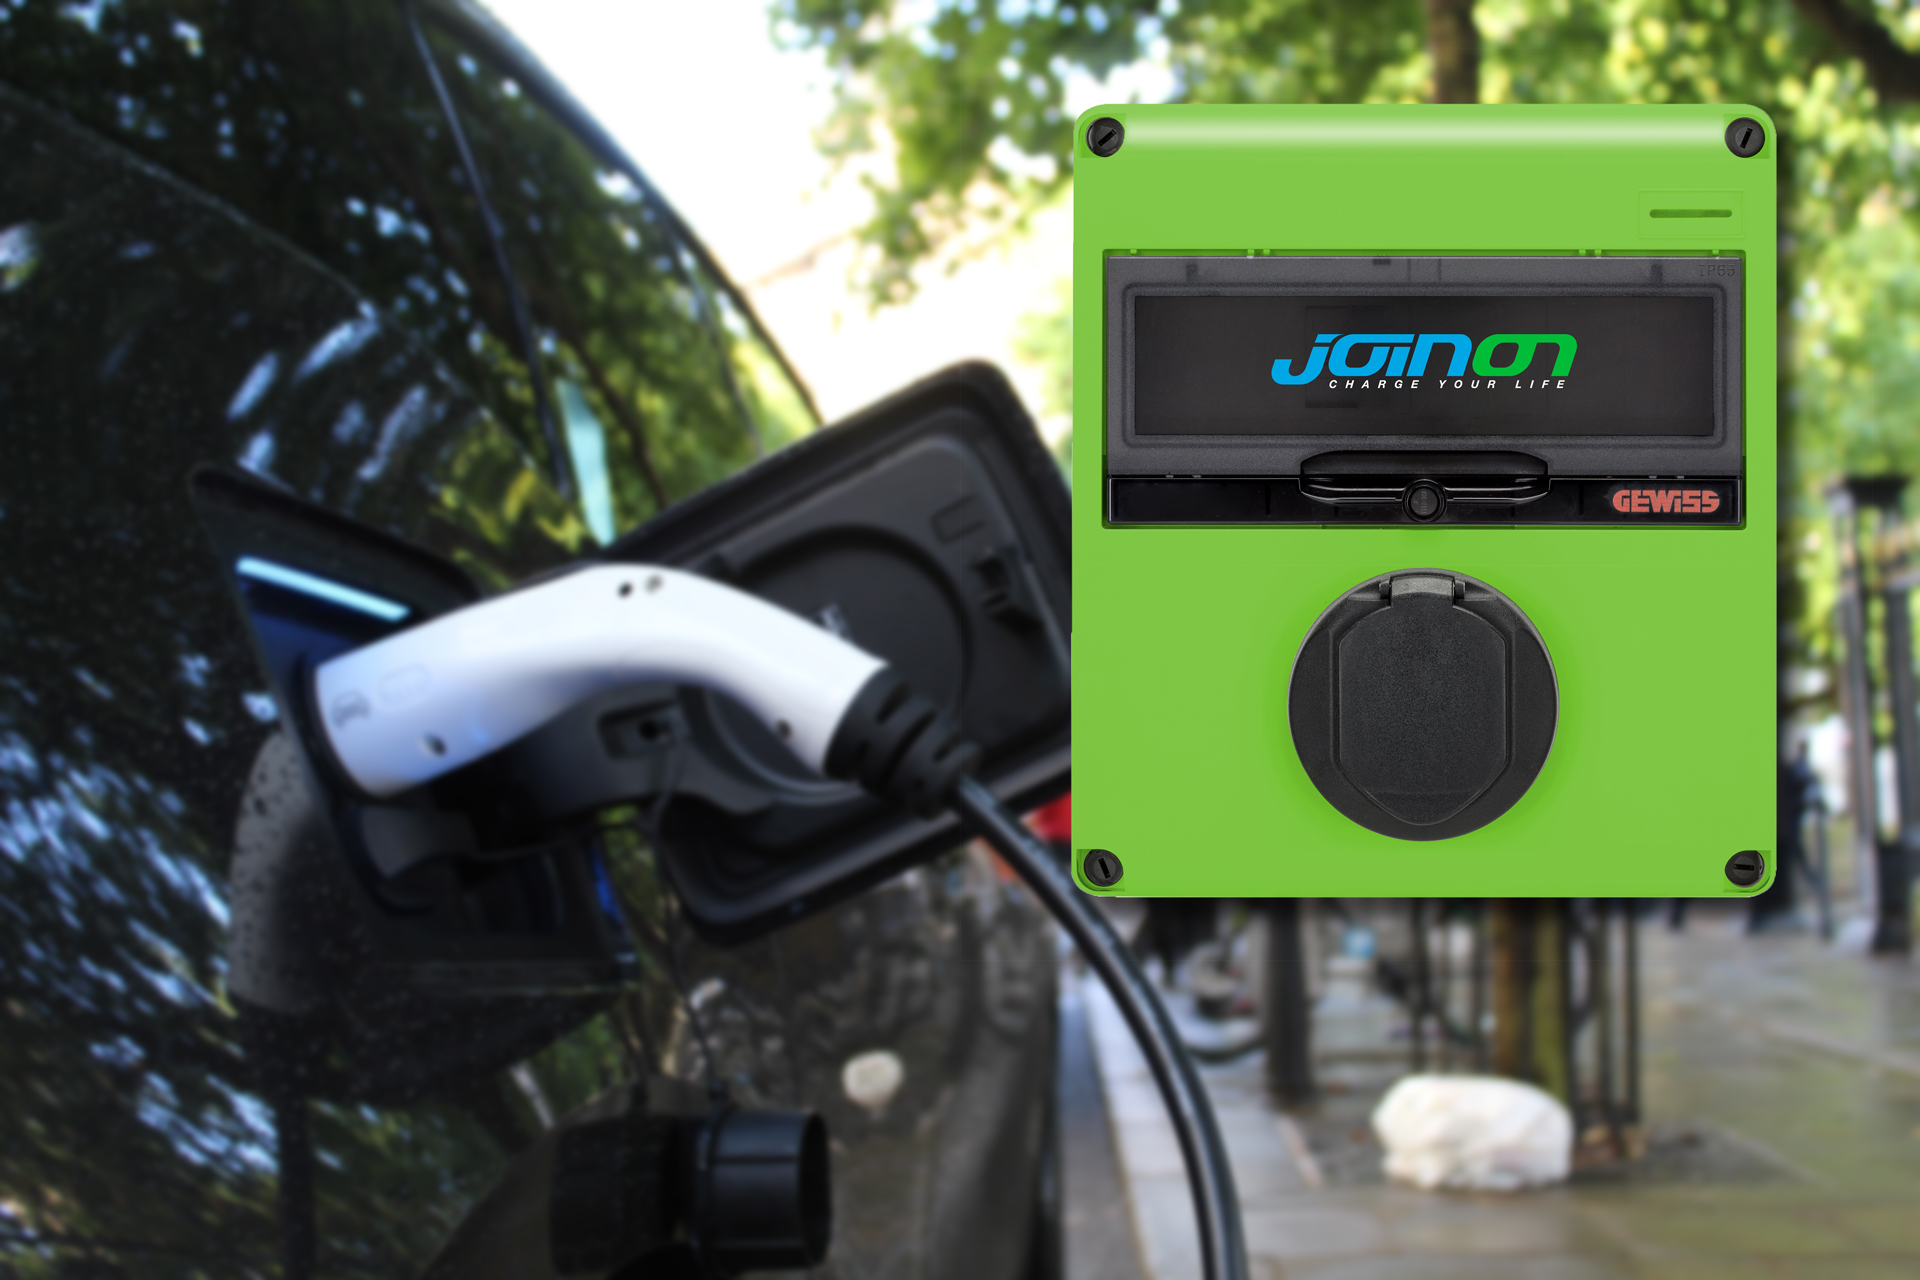 Wallbox Gewiss per ricaricare auto elettriche: una easy smart mobility